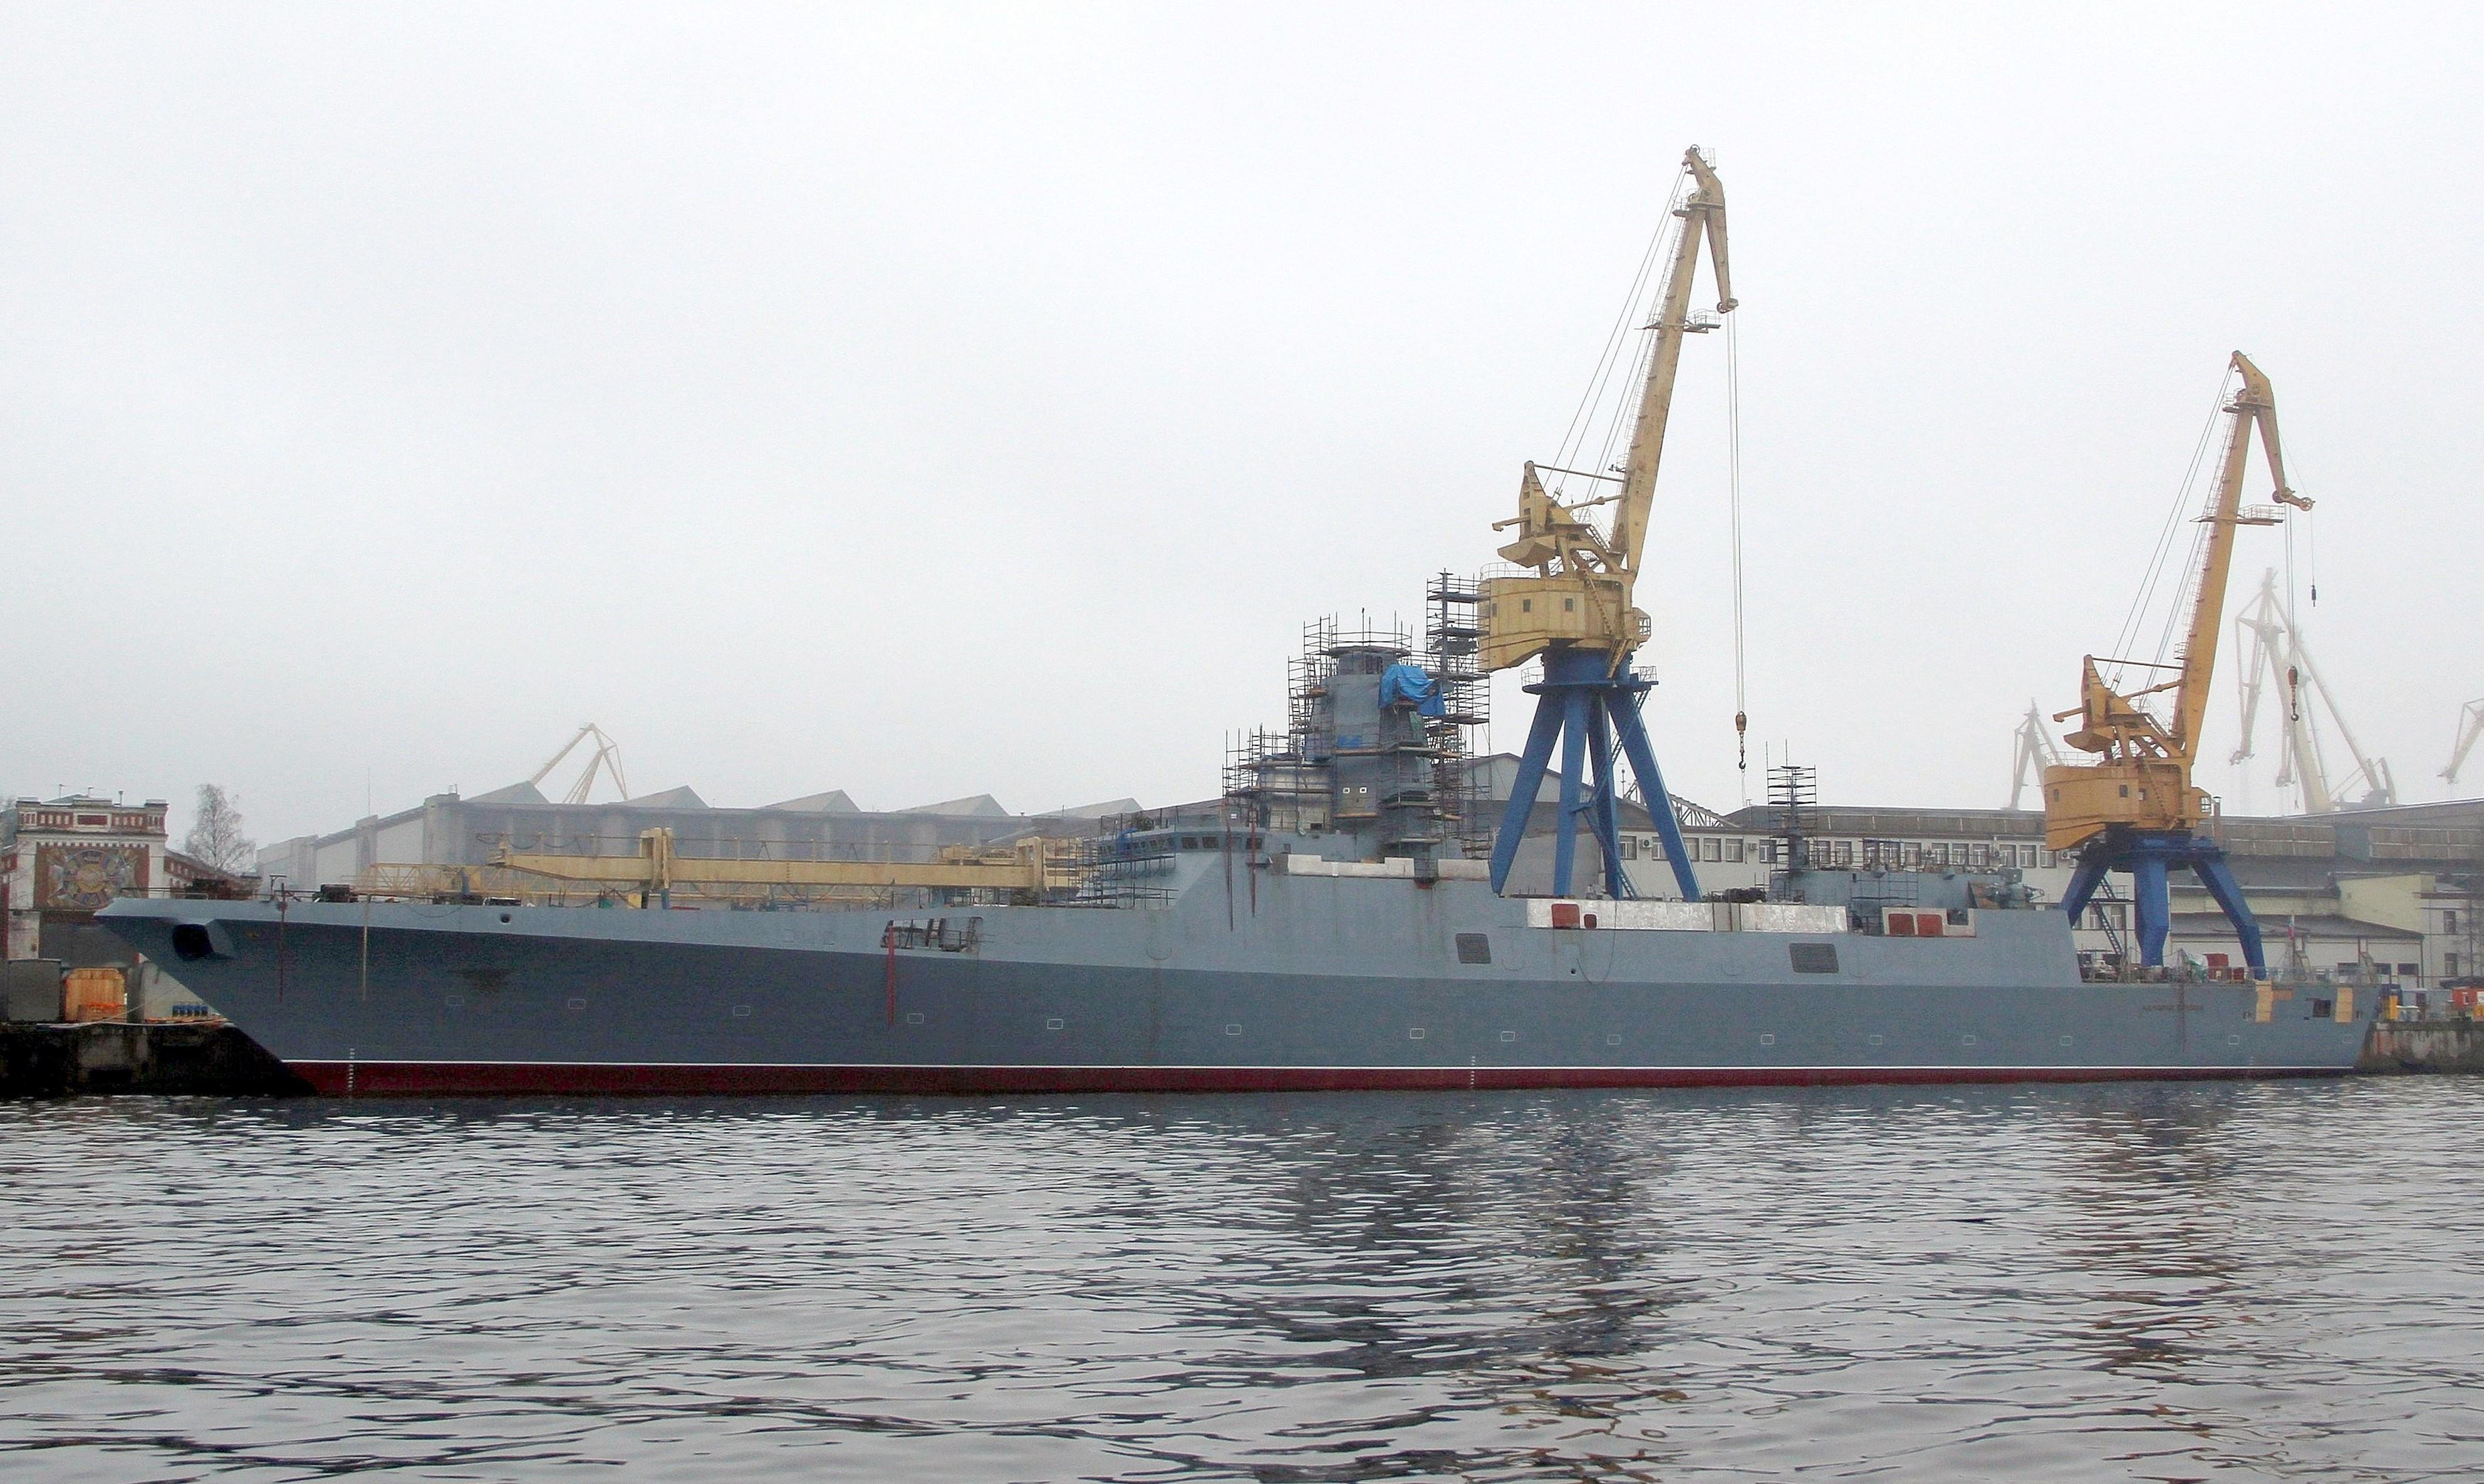 13-9209389-22350-admiral-golovko-severnaya-verf-12.11.2020